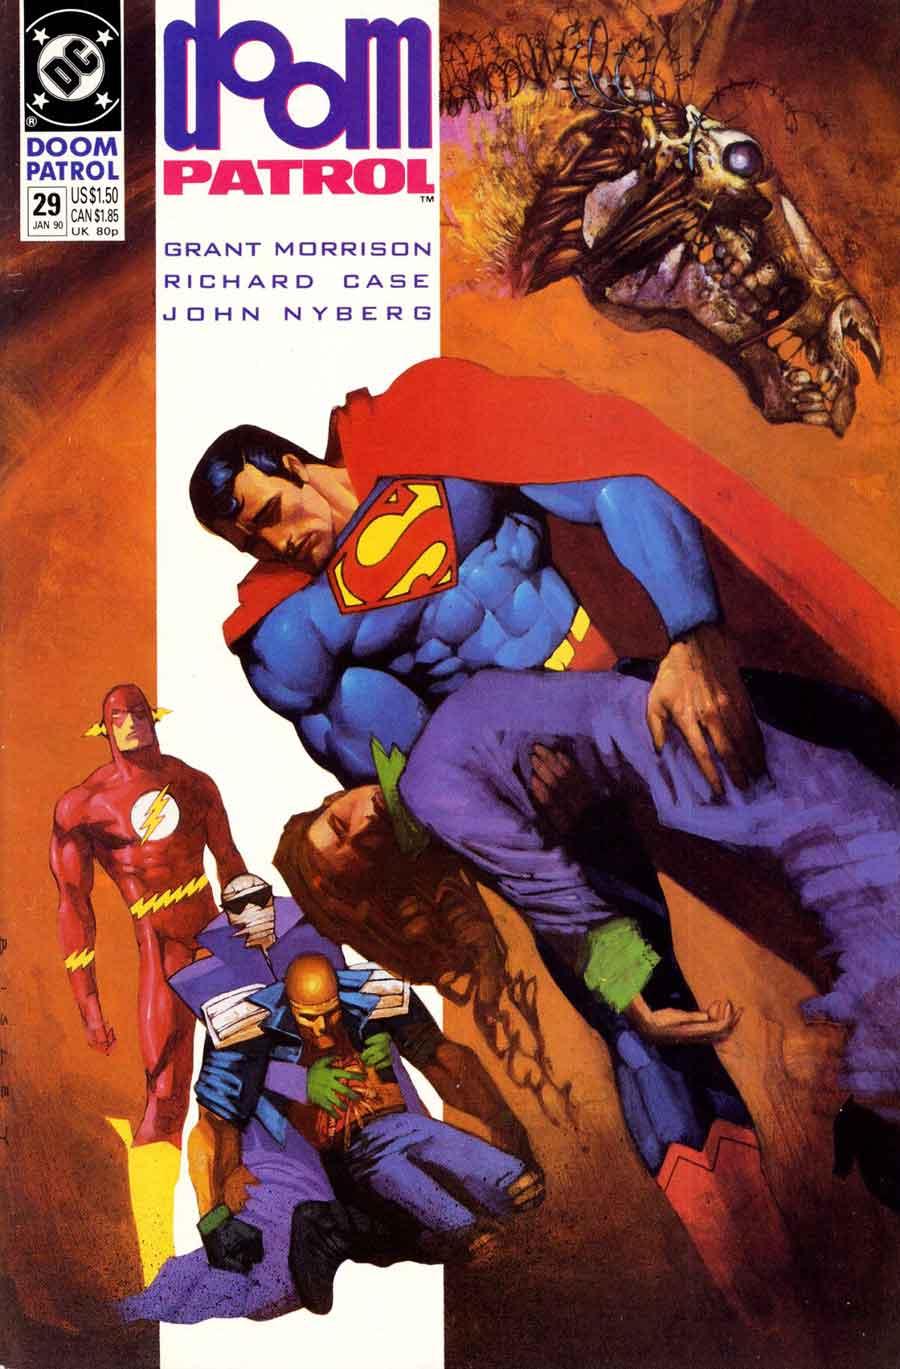 Doom Patrol #29 cover by Simon Bisley